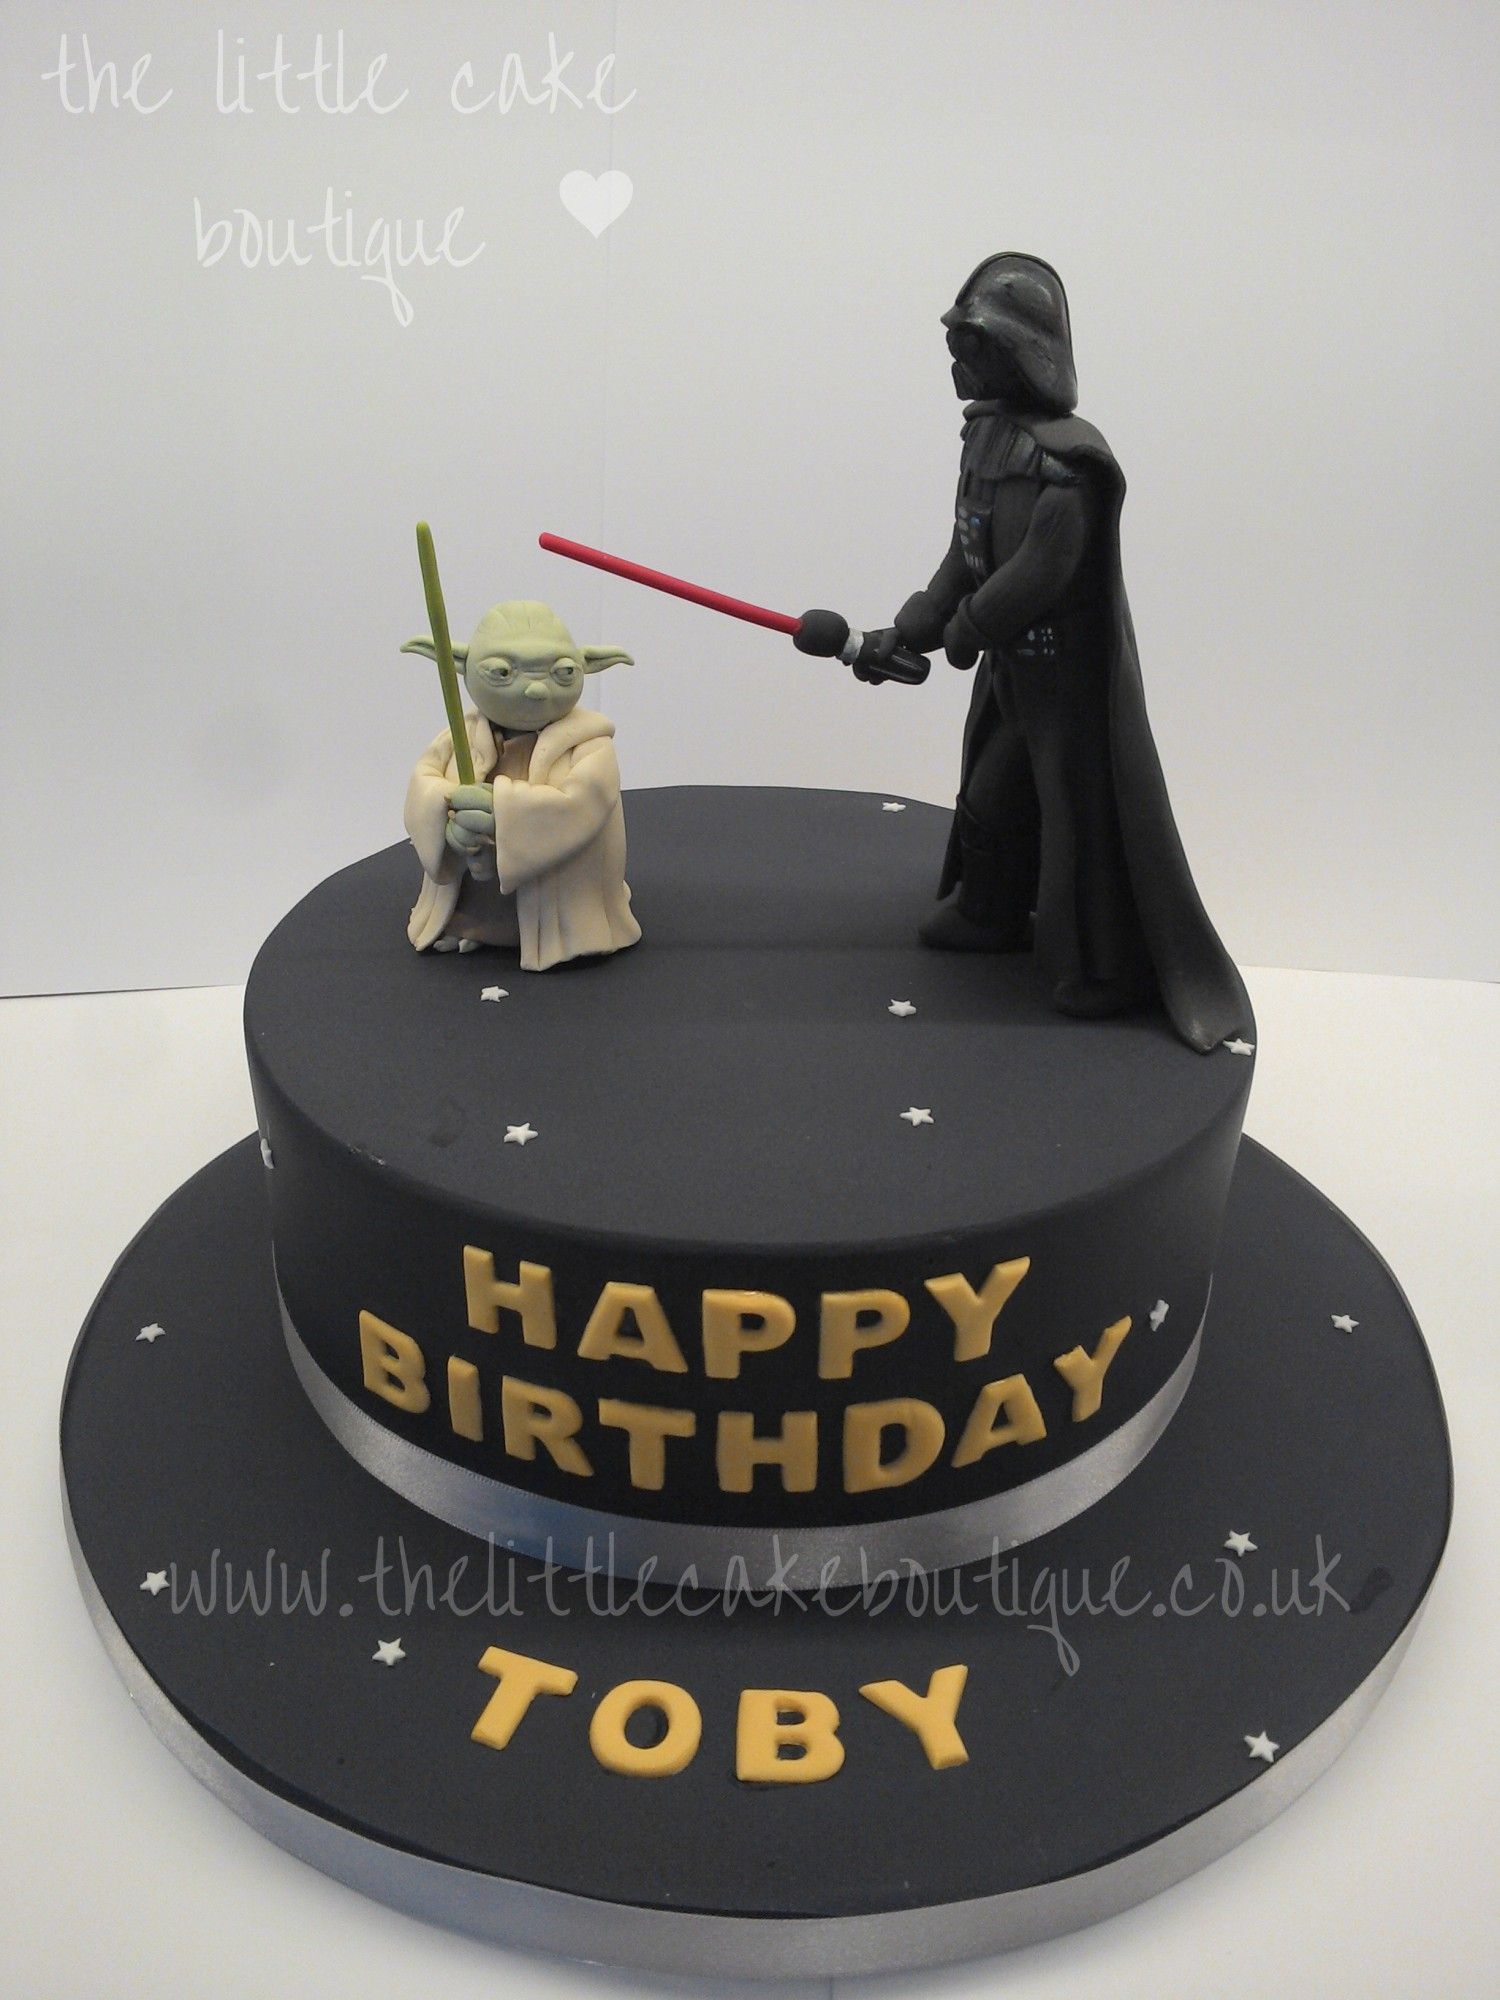 Astounding Star Wars Birthday Cake With Handmade Sugar Darth Vader And Yoda Birthday Cards Printable Trancafe Filternl